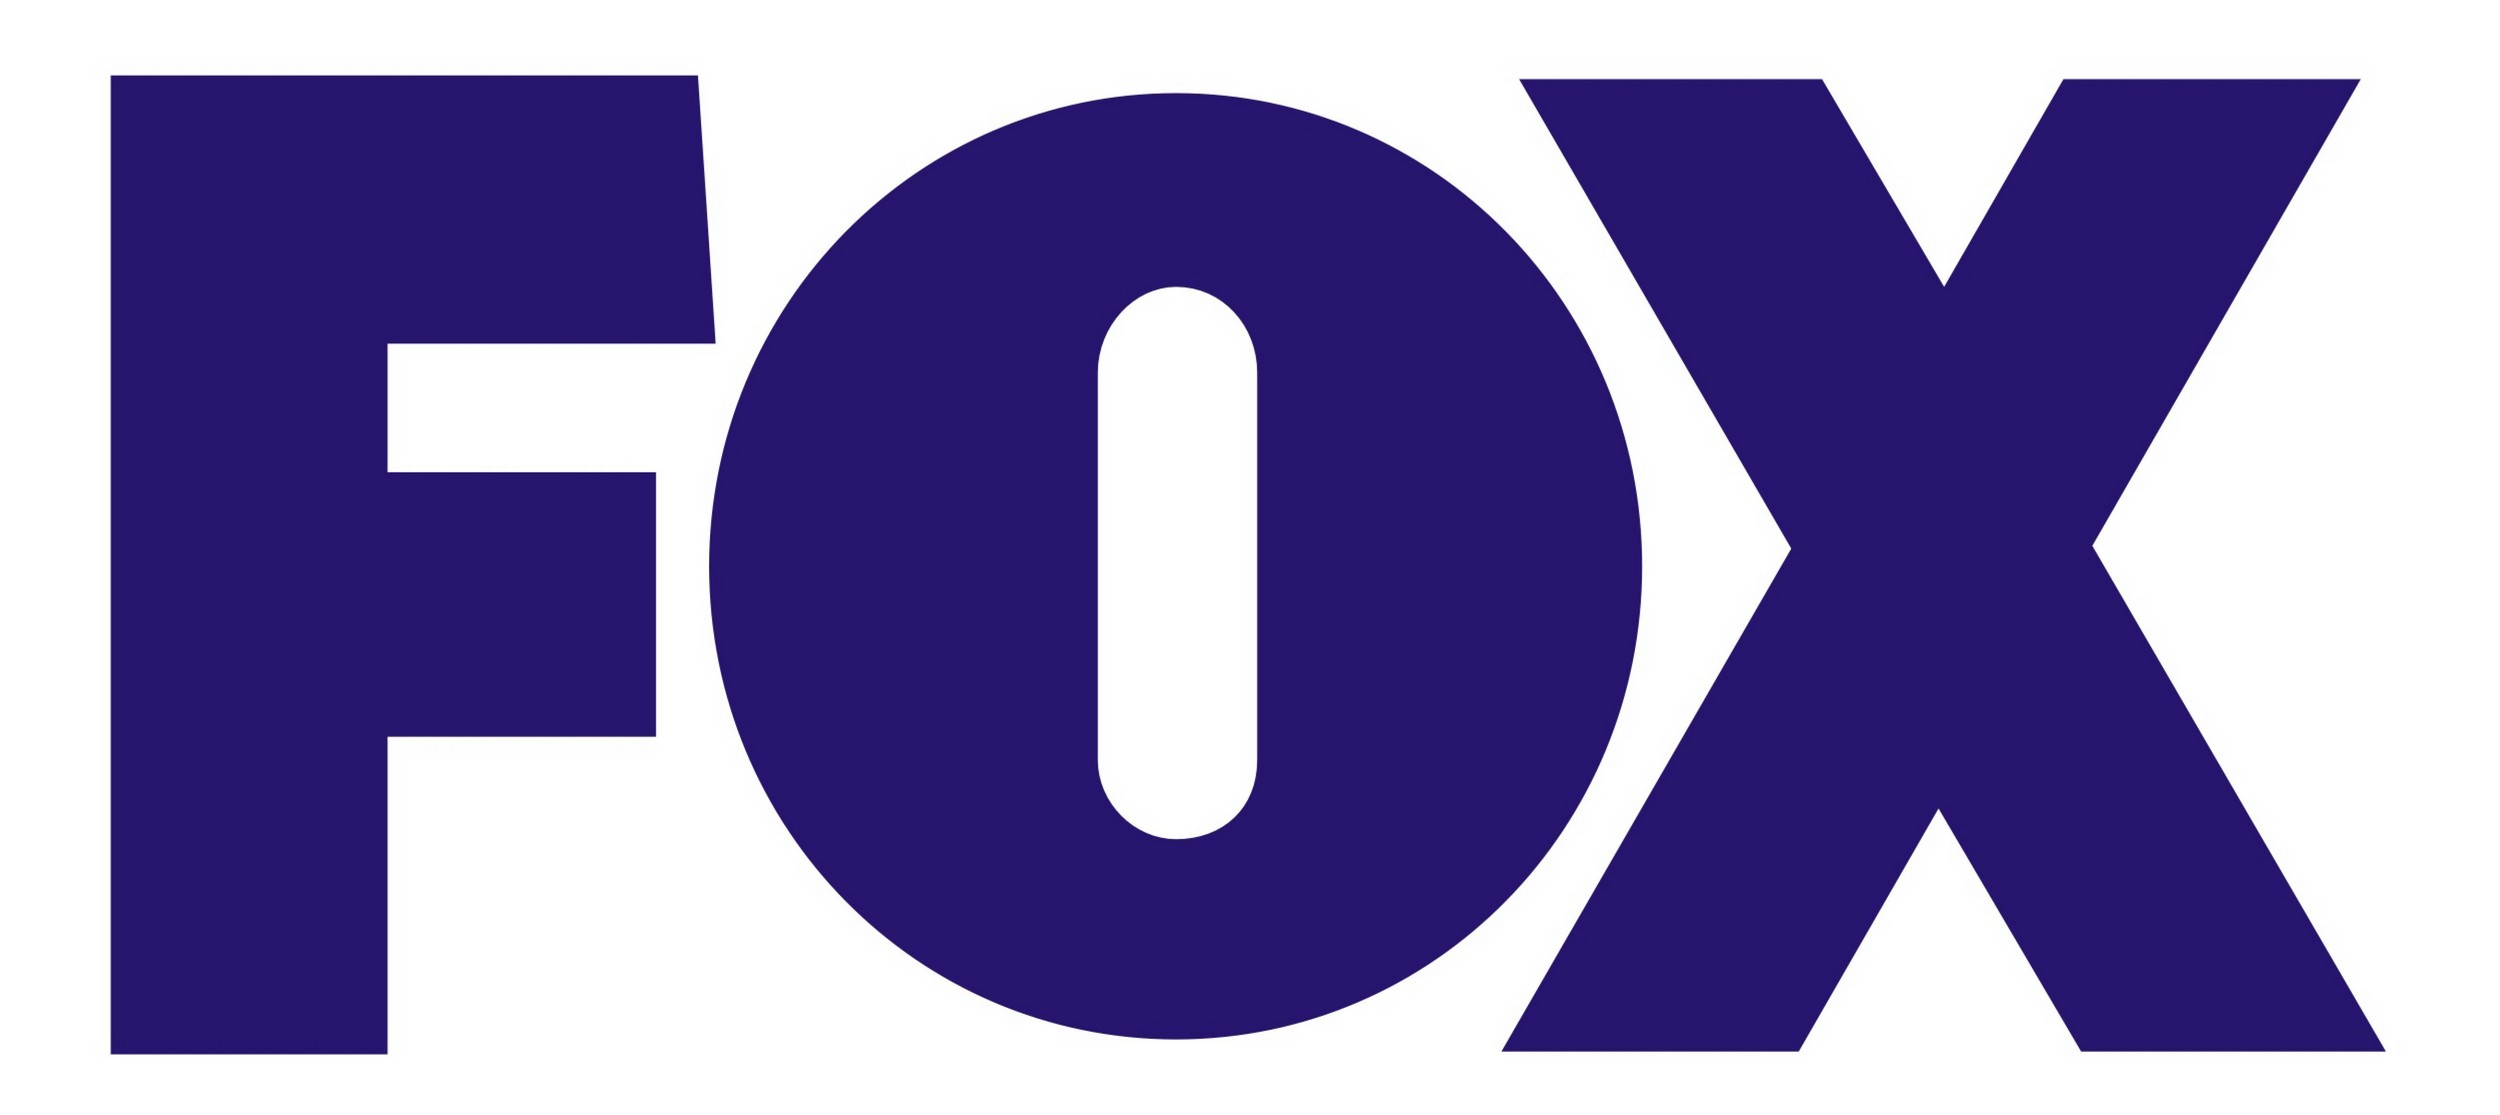 Logo Fox Png.